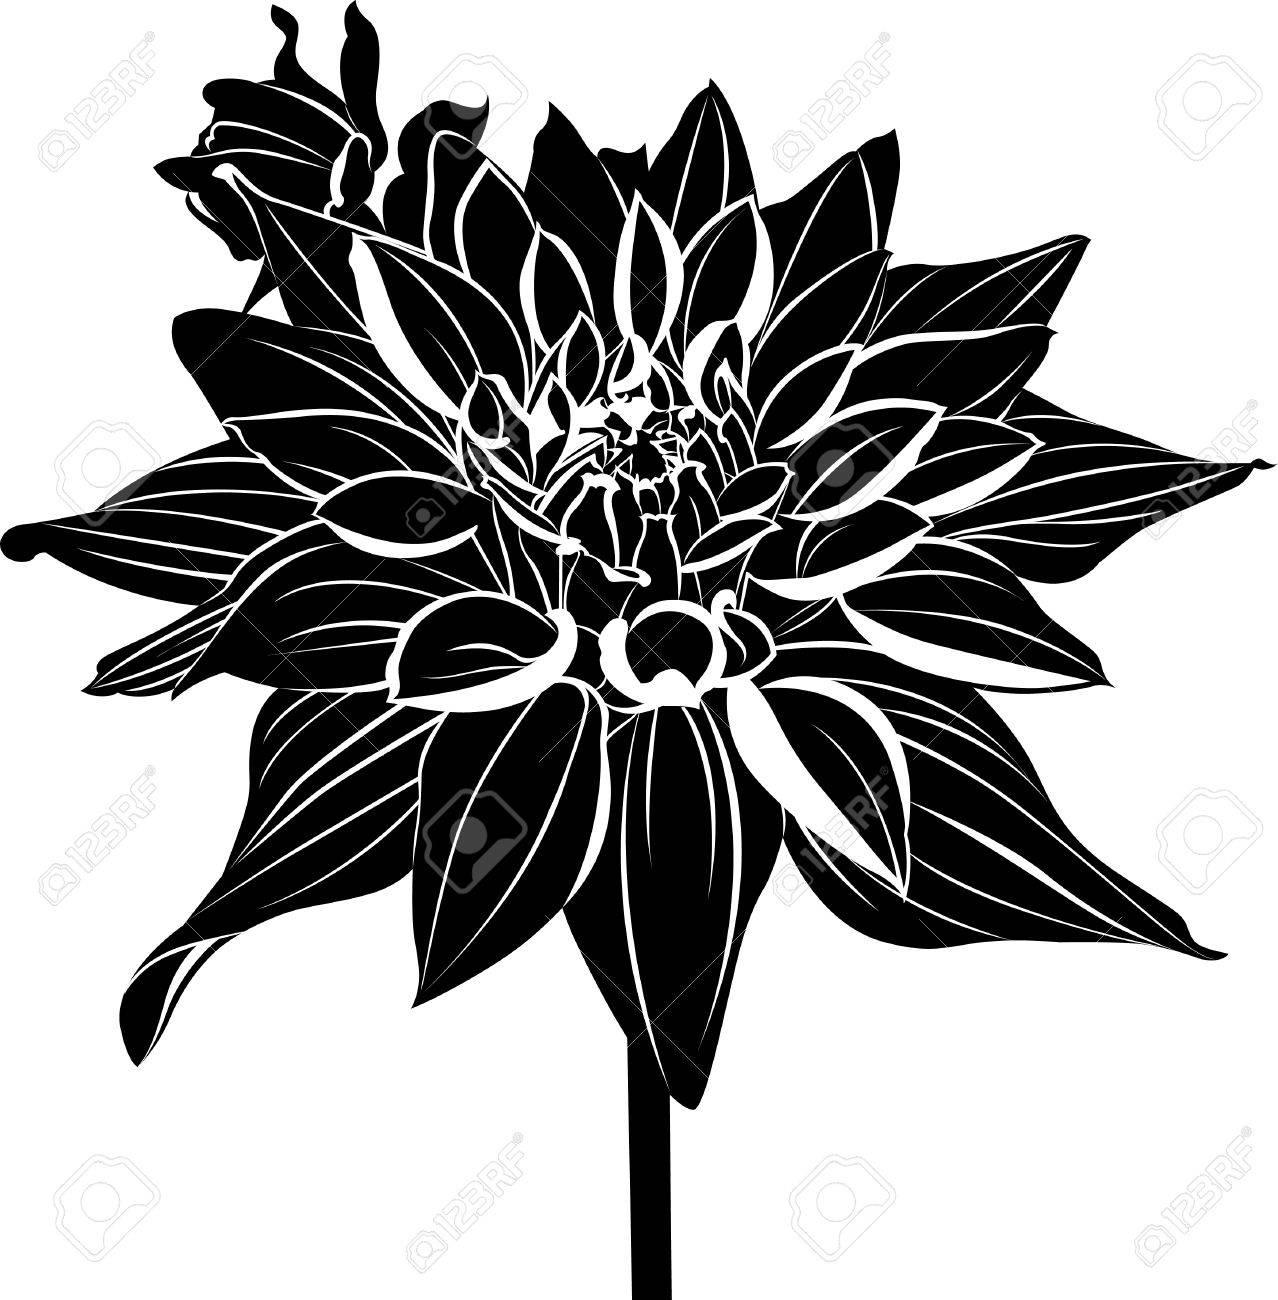 Dahlias vintage elegant flowers black and white vector dahlias vintage elegant flowers black and white vector illustration dahlias flowers vector izmirmasajfo